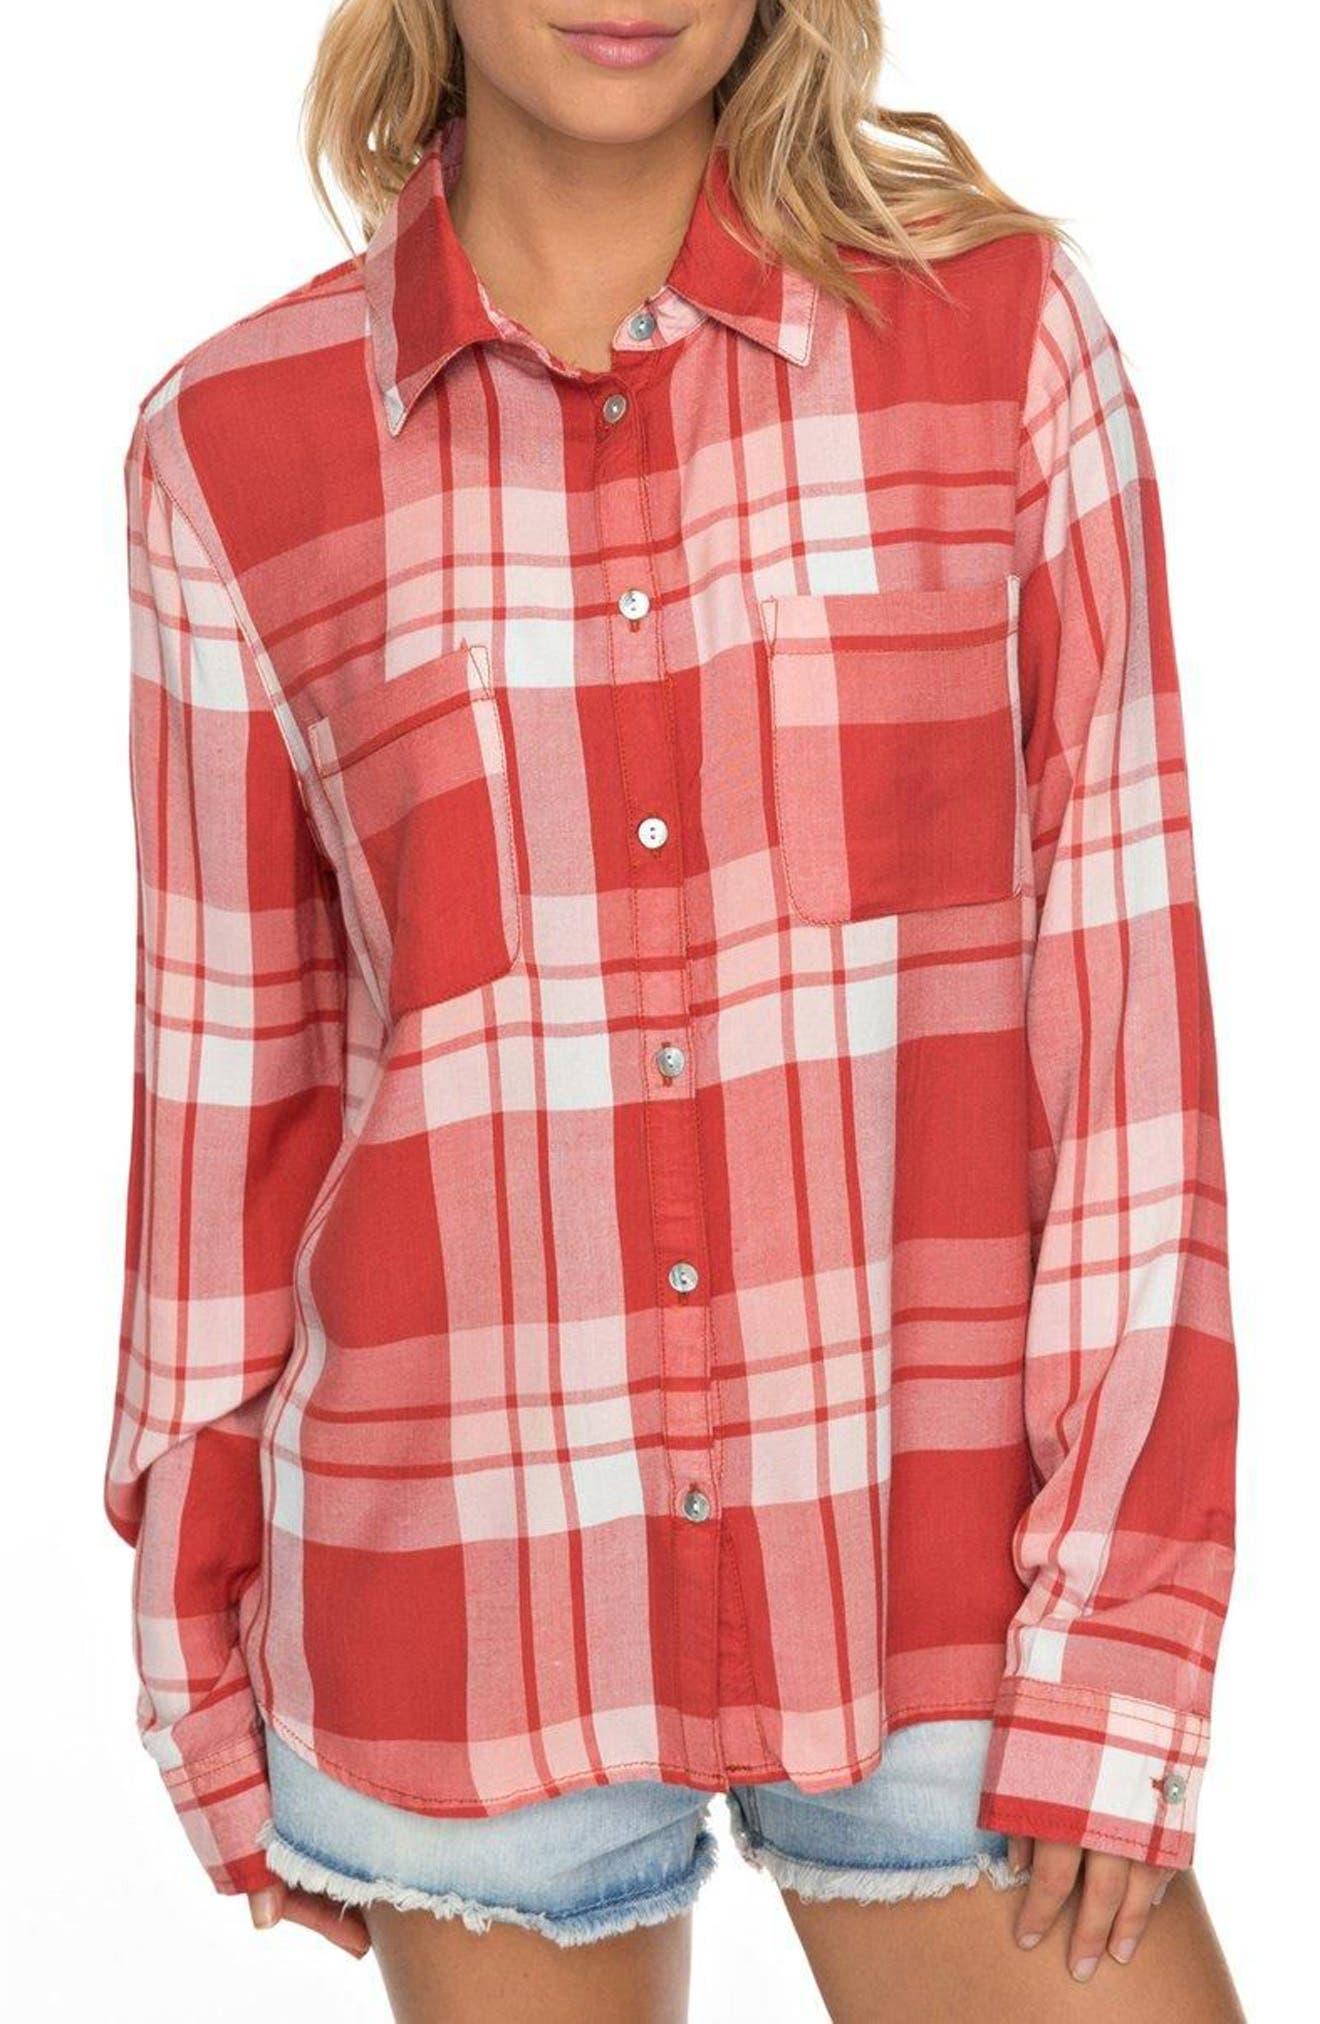 Setai Miami Plaid Shirt,                         Main,                         color, Tandoori Spice Great Plaid